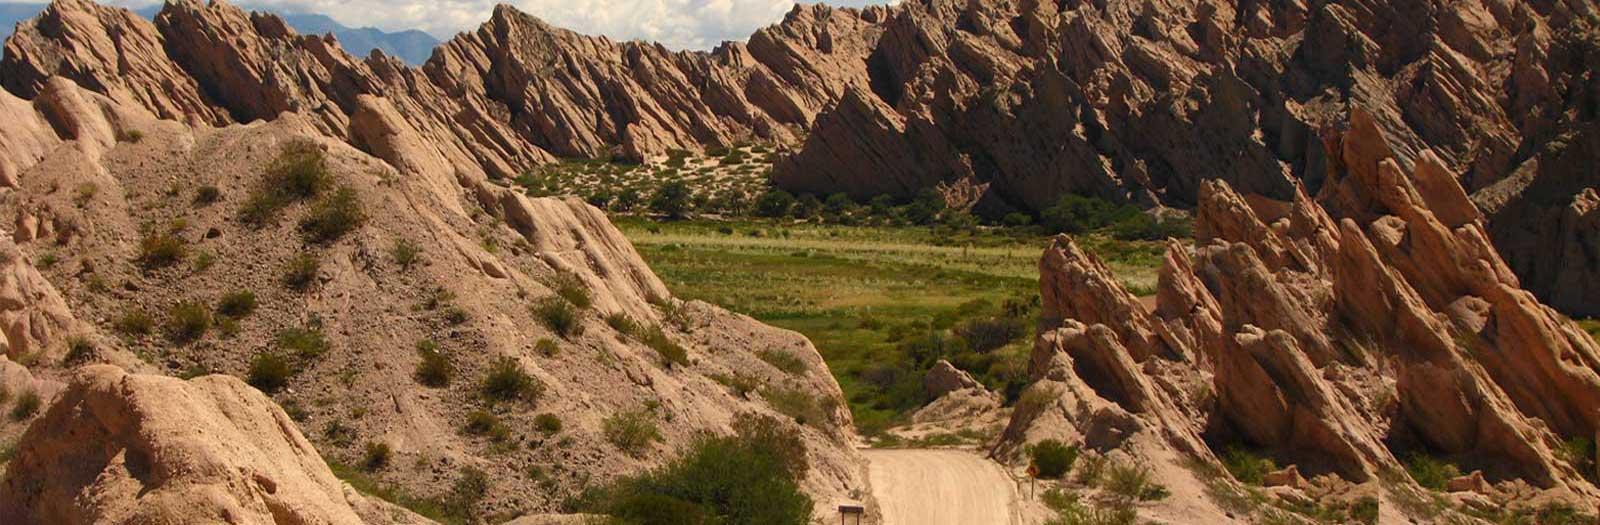 Quebrada de las flechas, Angastaco, Salta